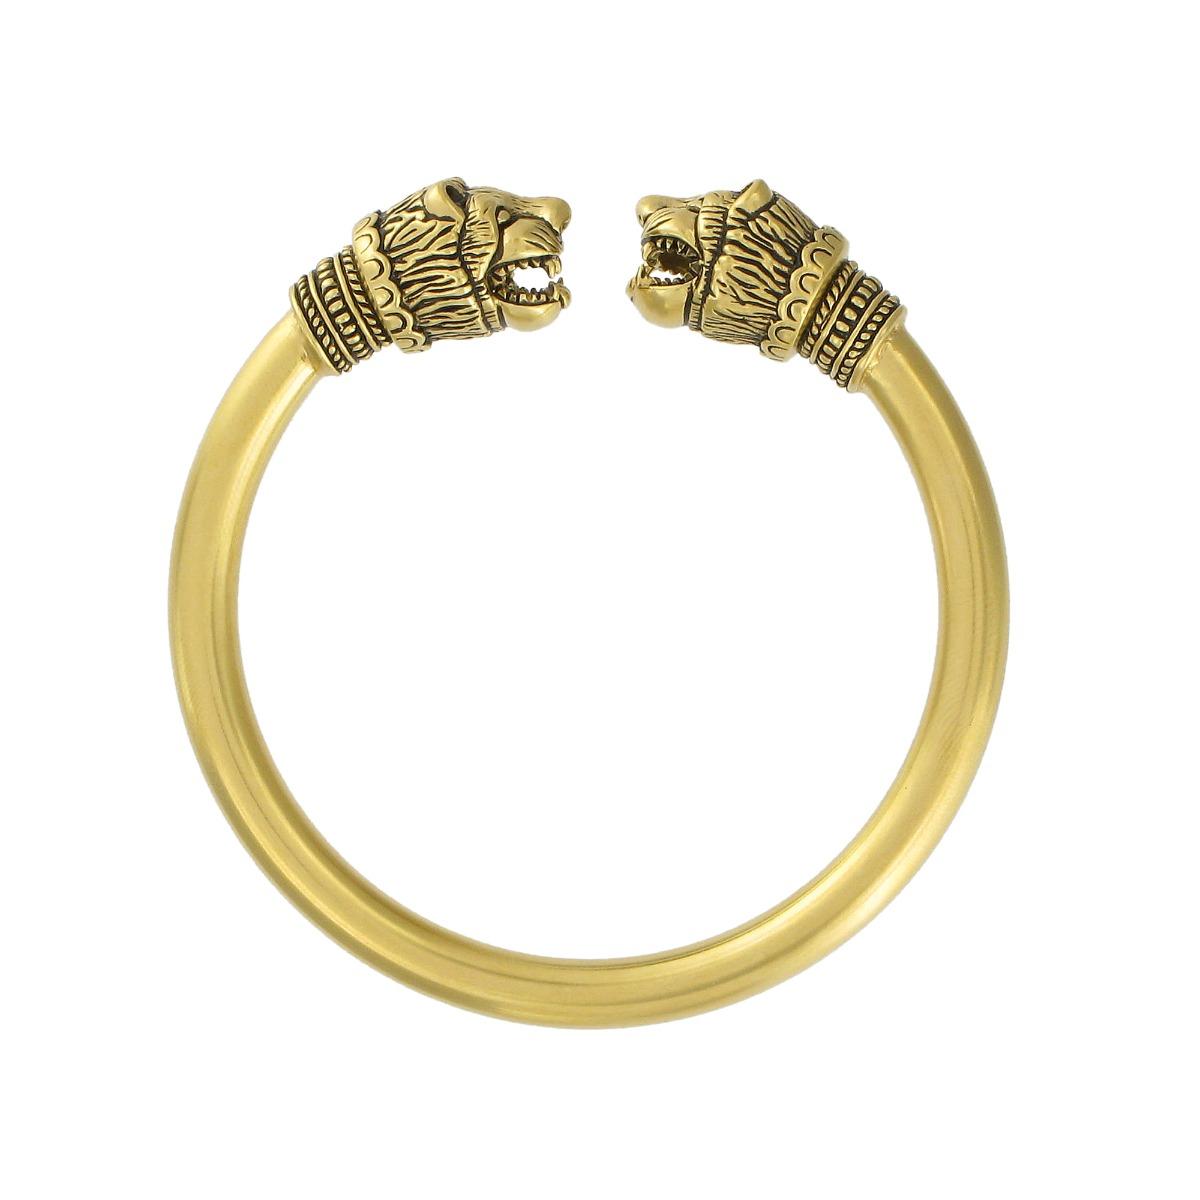 Lion head's bracelet